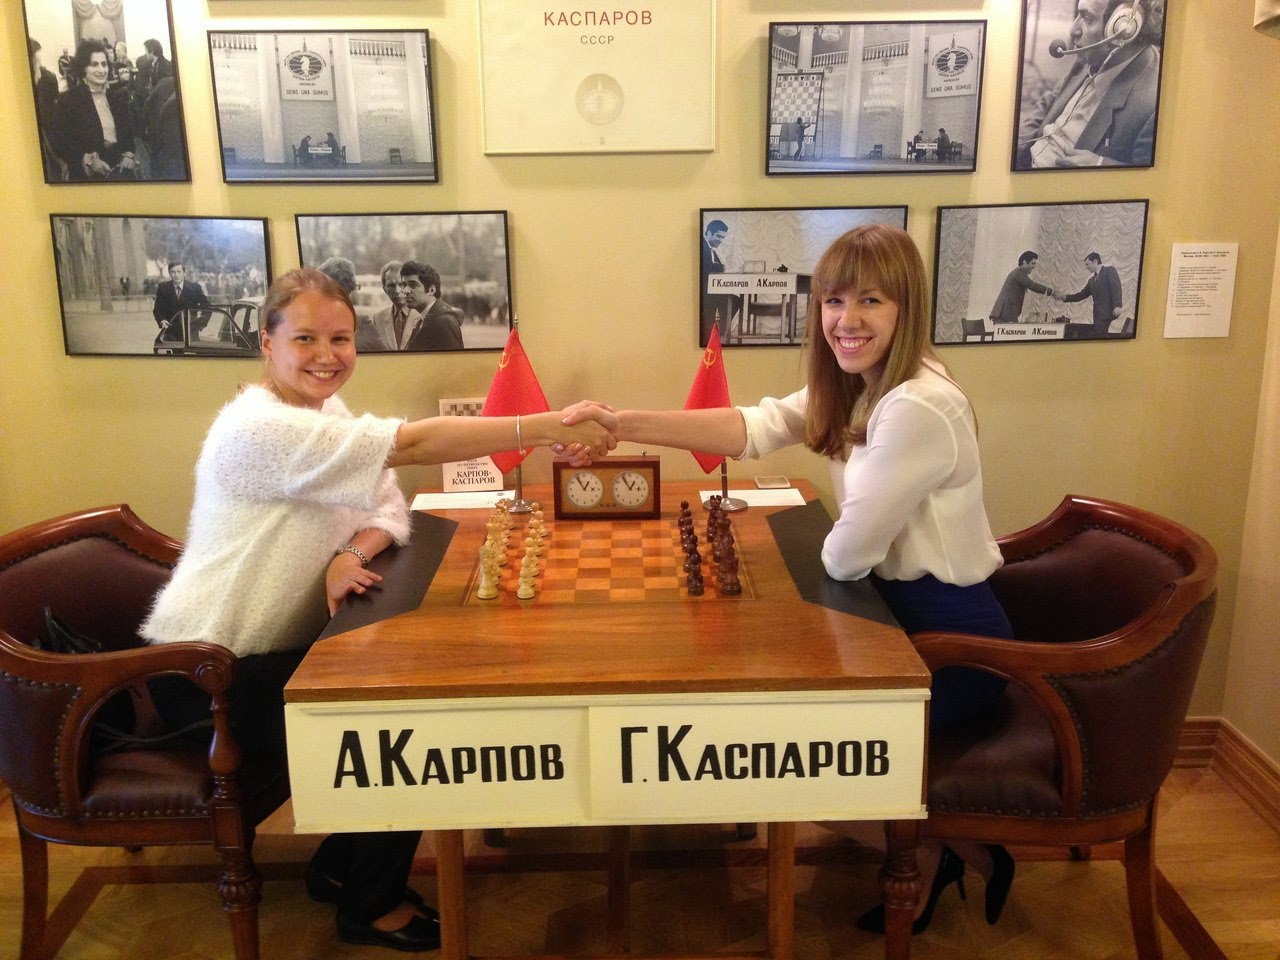 Les grands-maîtres russes Valentina Gunina et Olga Girya au musée russe des échecs Photo © Olga Girya pour Chess & Strategy